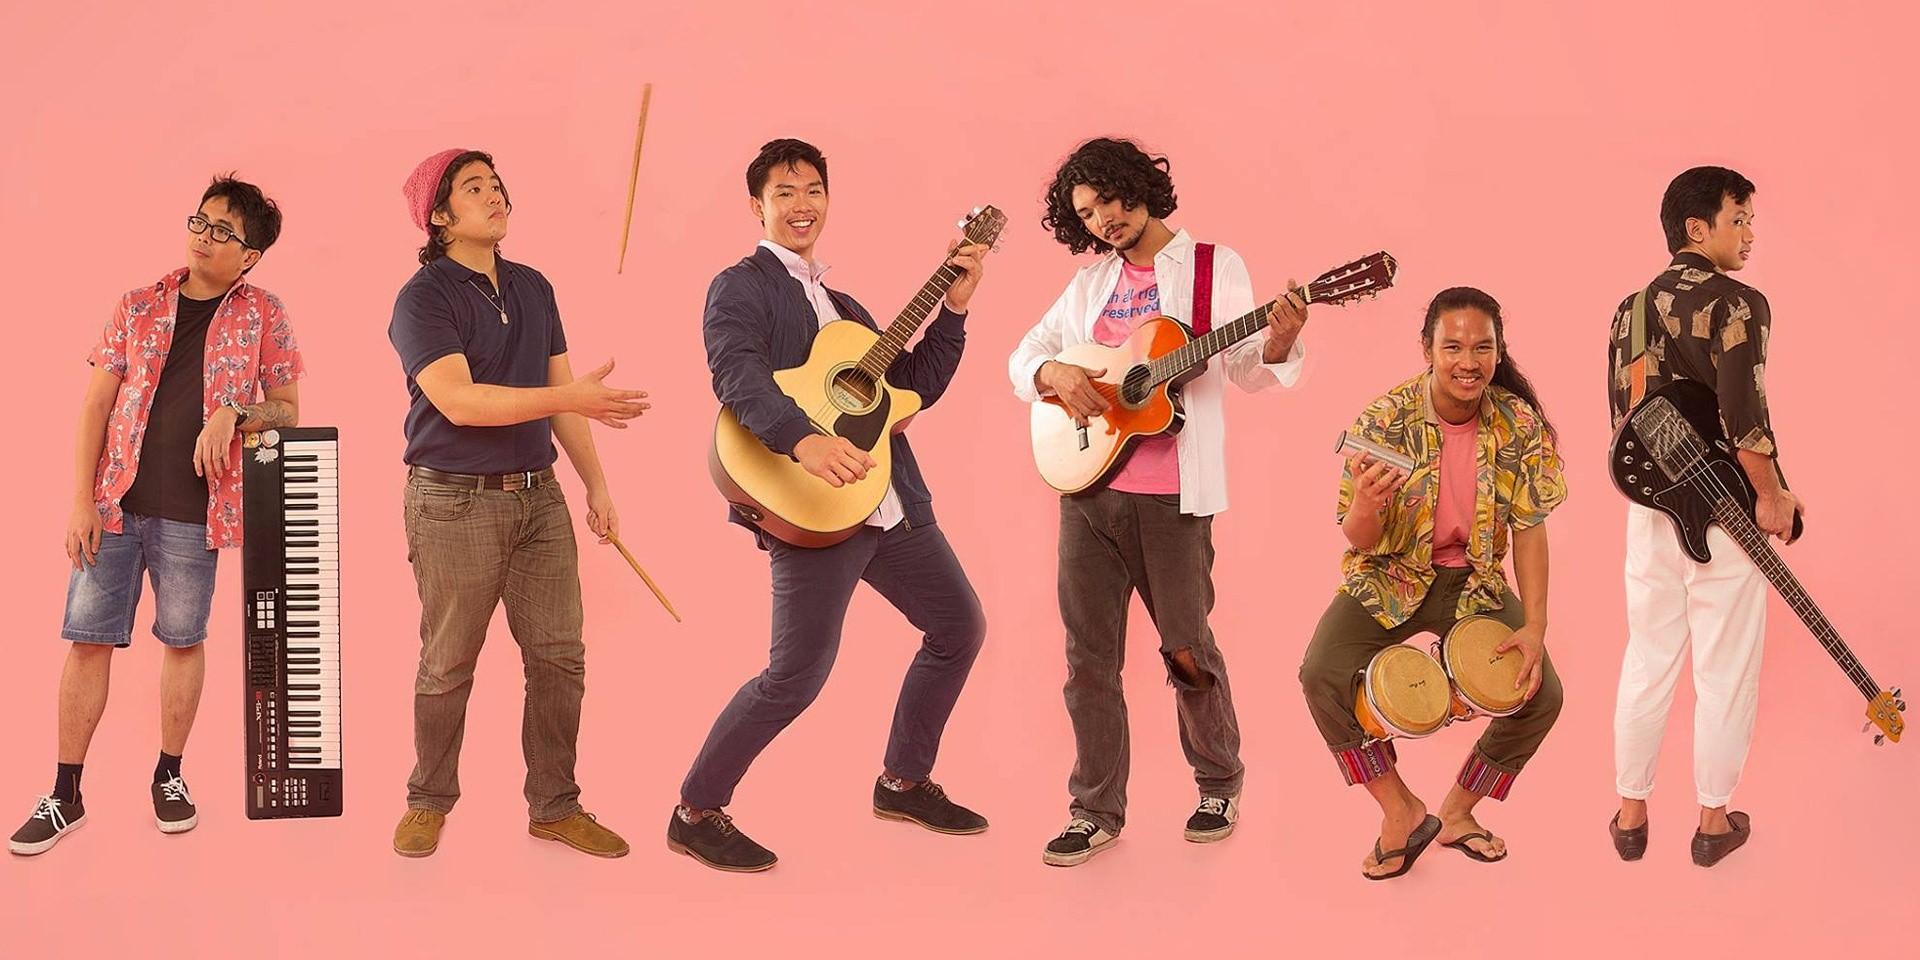 Pinkmen unveil double single release 'Your Name' and 'Hanggang Sa Muli' – listen